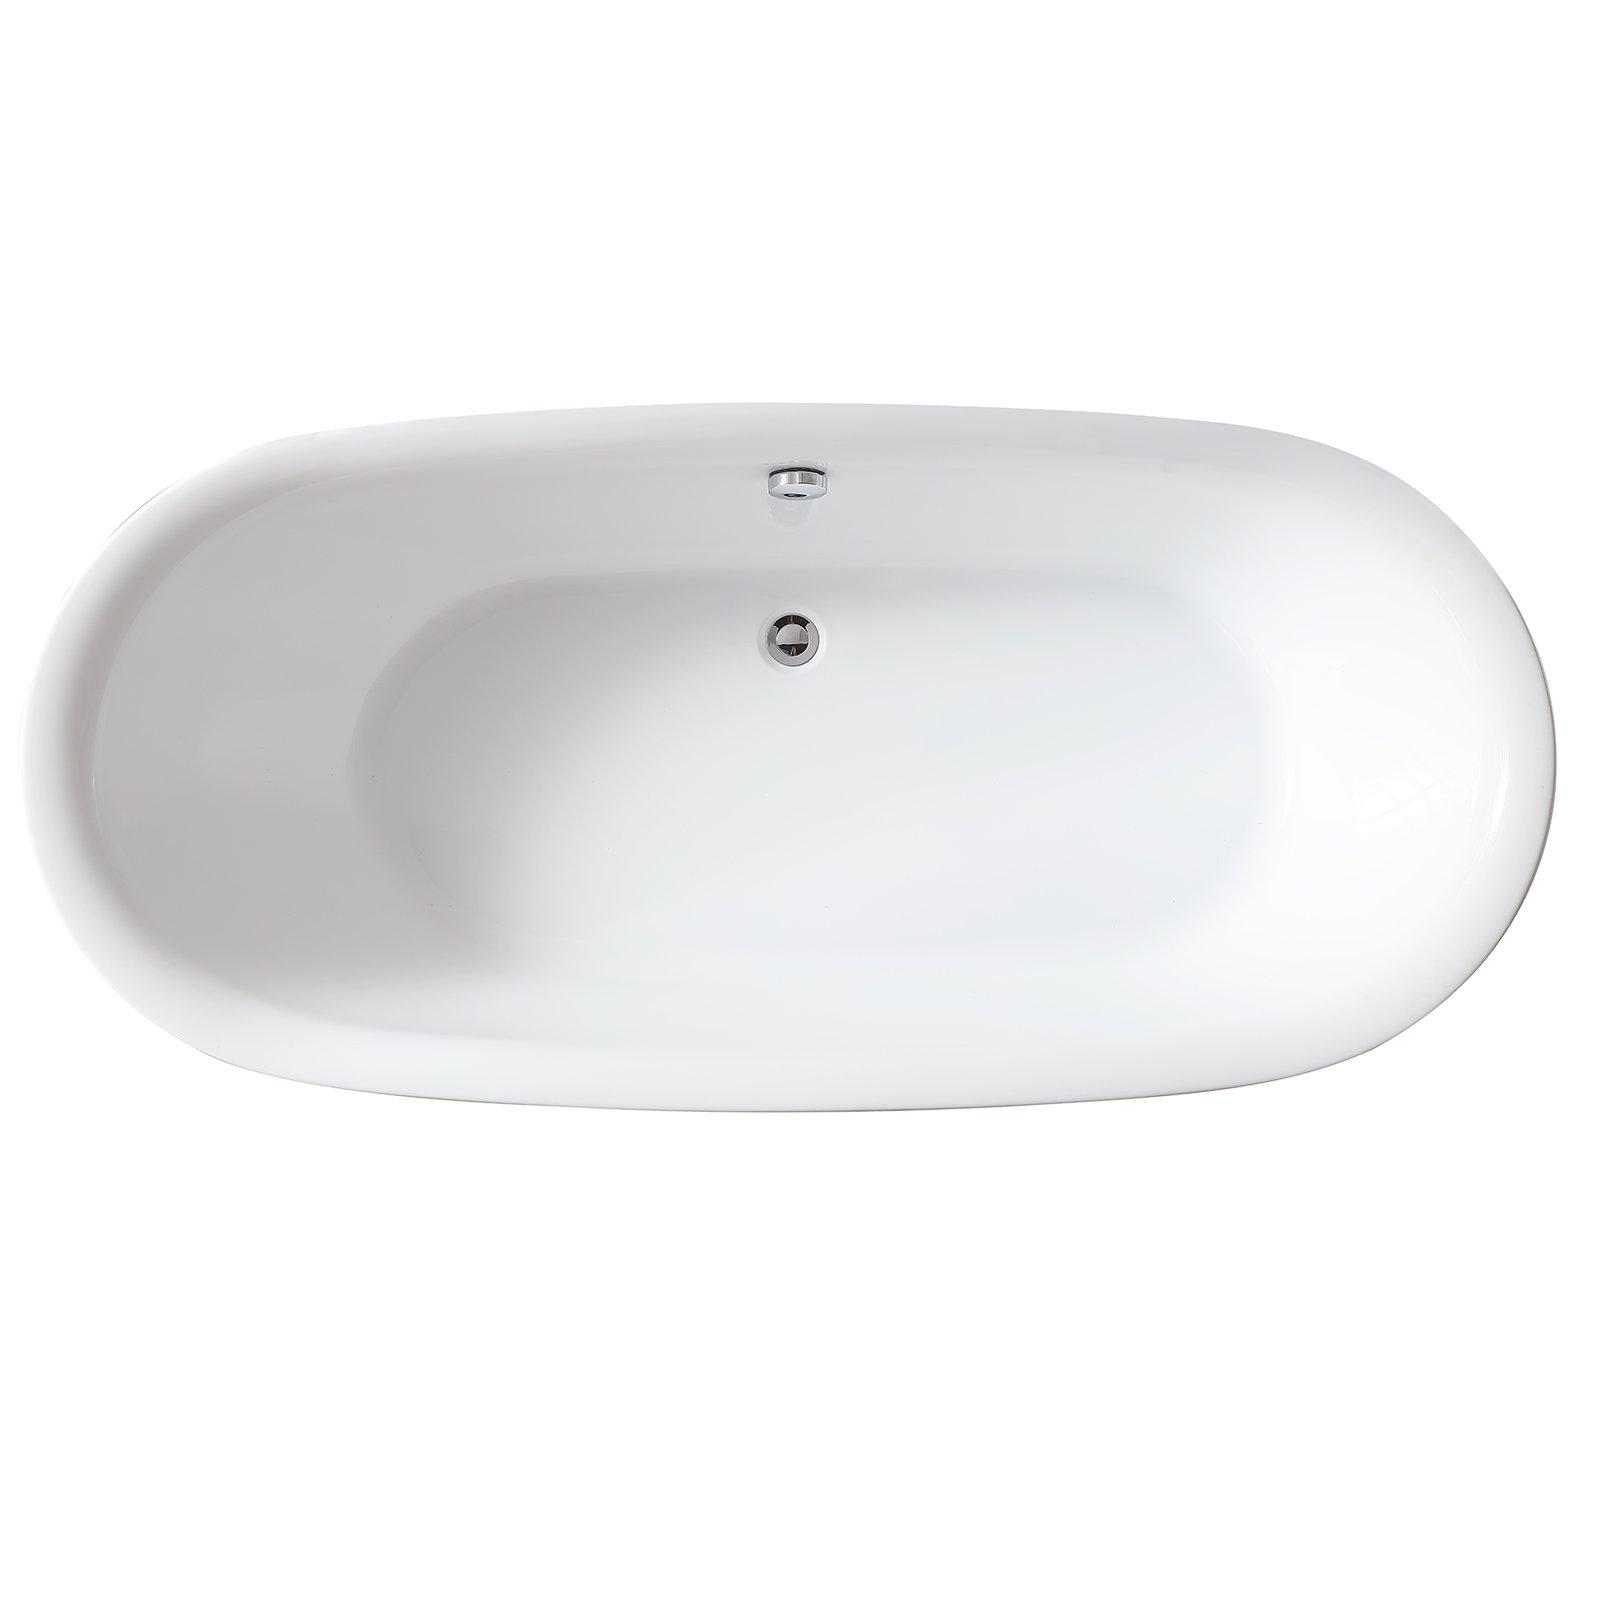 Freistehende Badewanne ROMA ACRYL weiß BS-916 180x84 inkl. Armatur 8028 zoom thumbnail 4